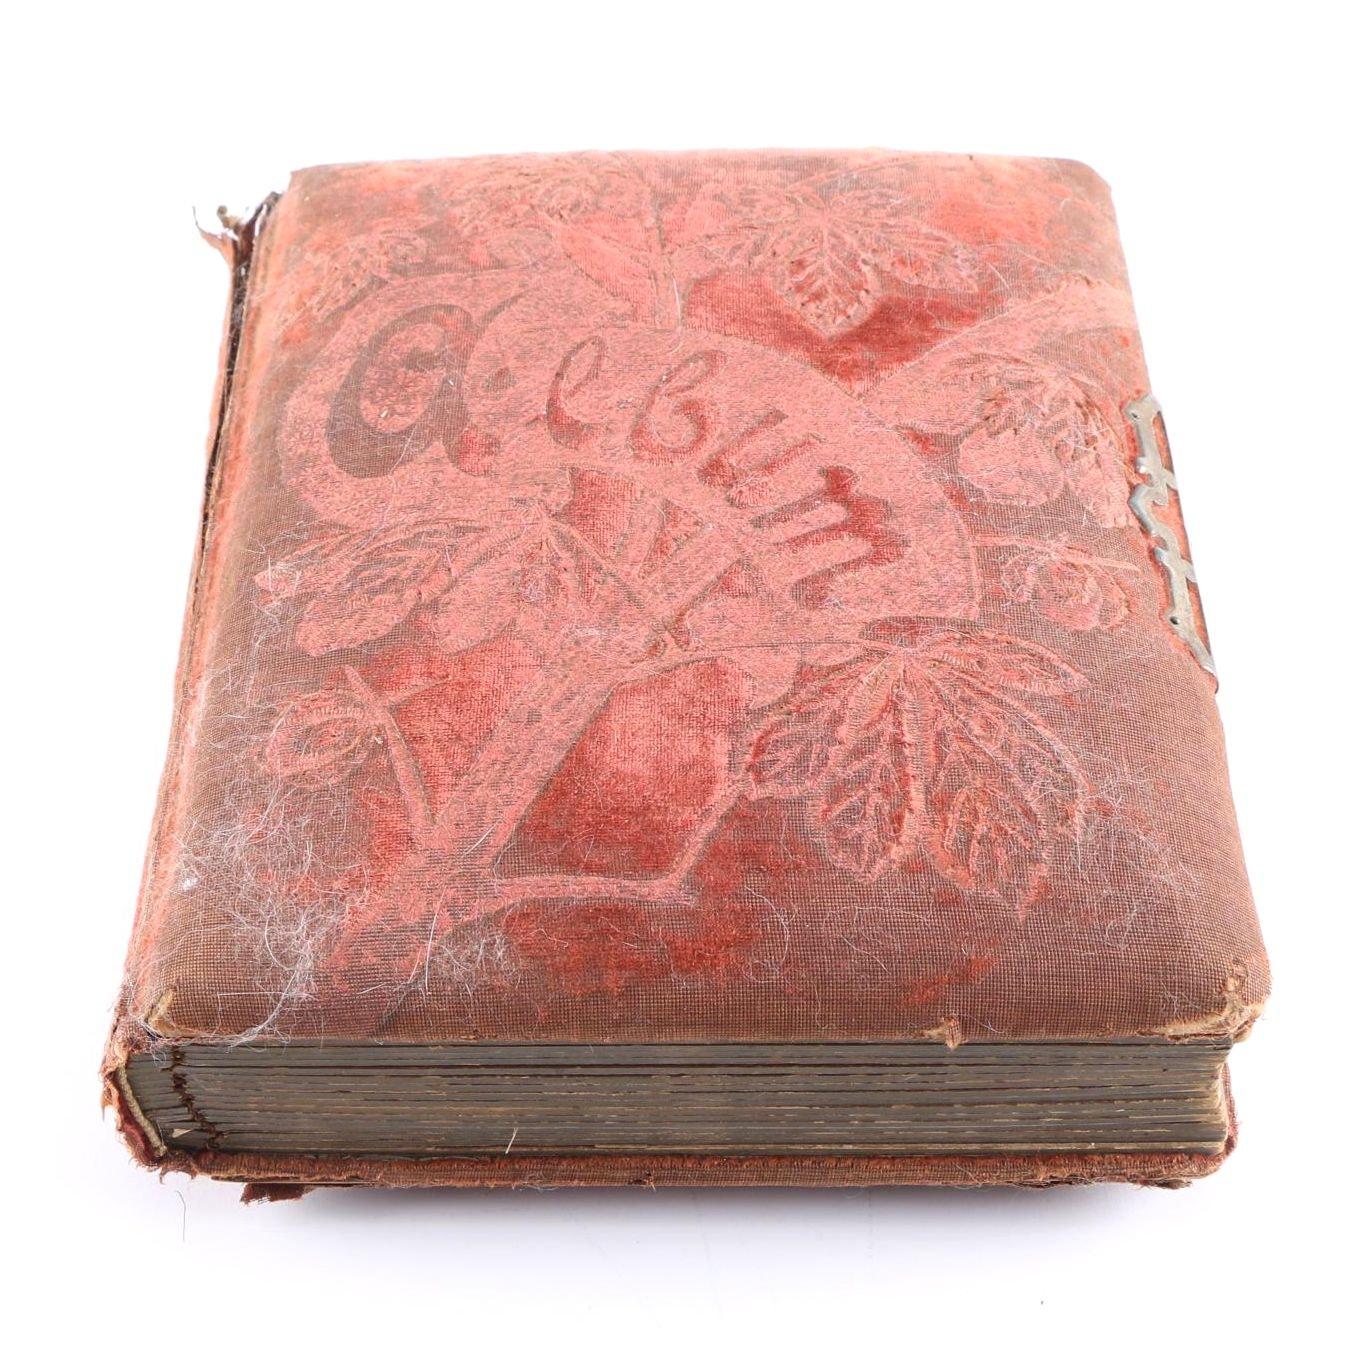 Antique Photo Album With Ambrotype and Albumen Photographs